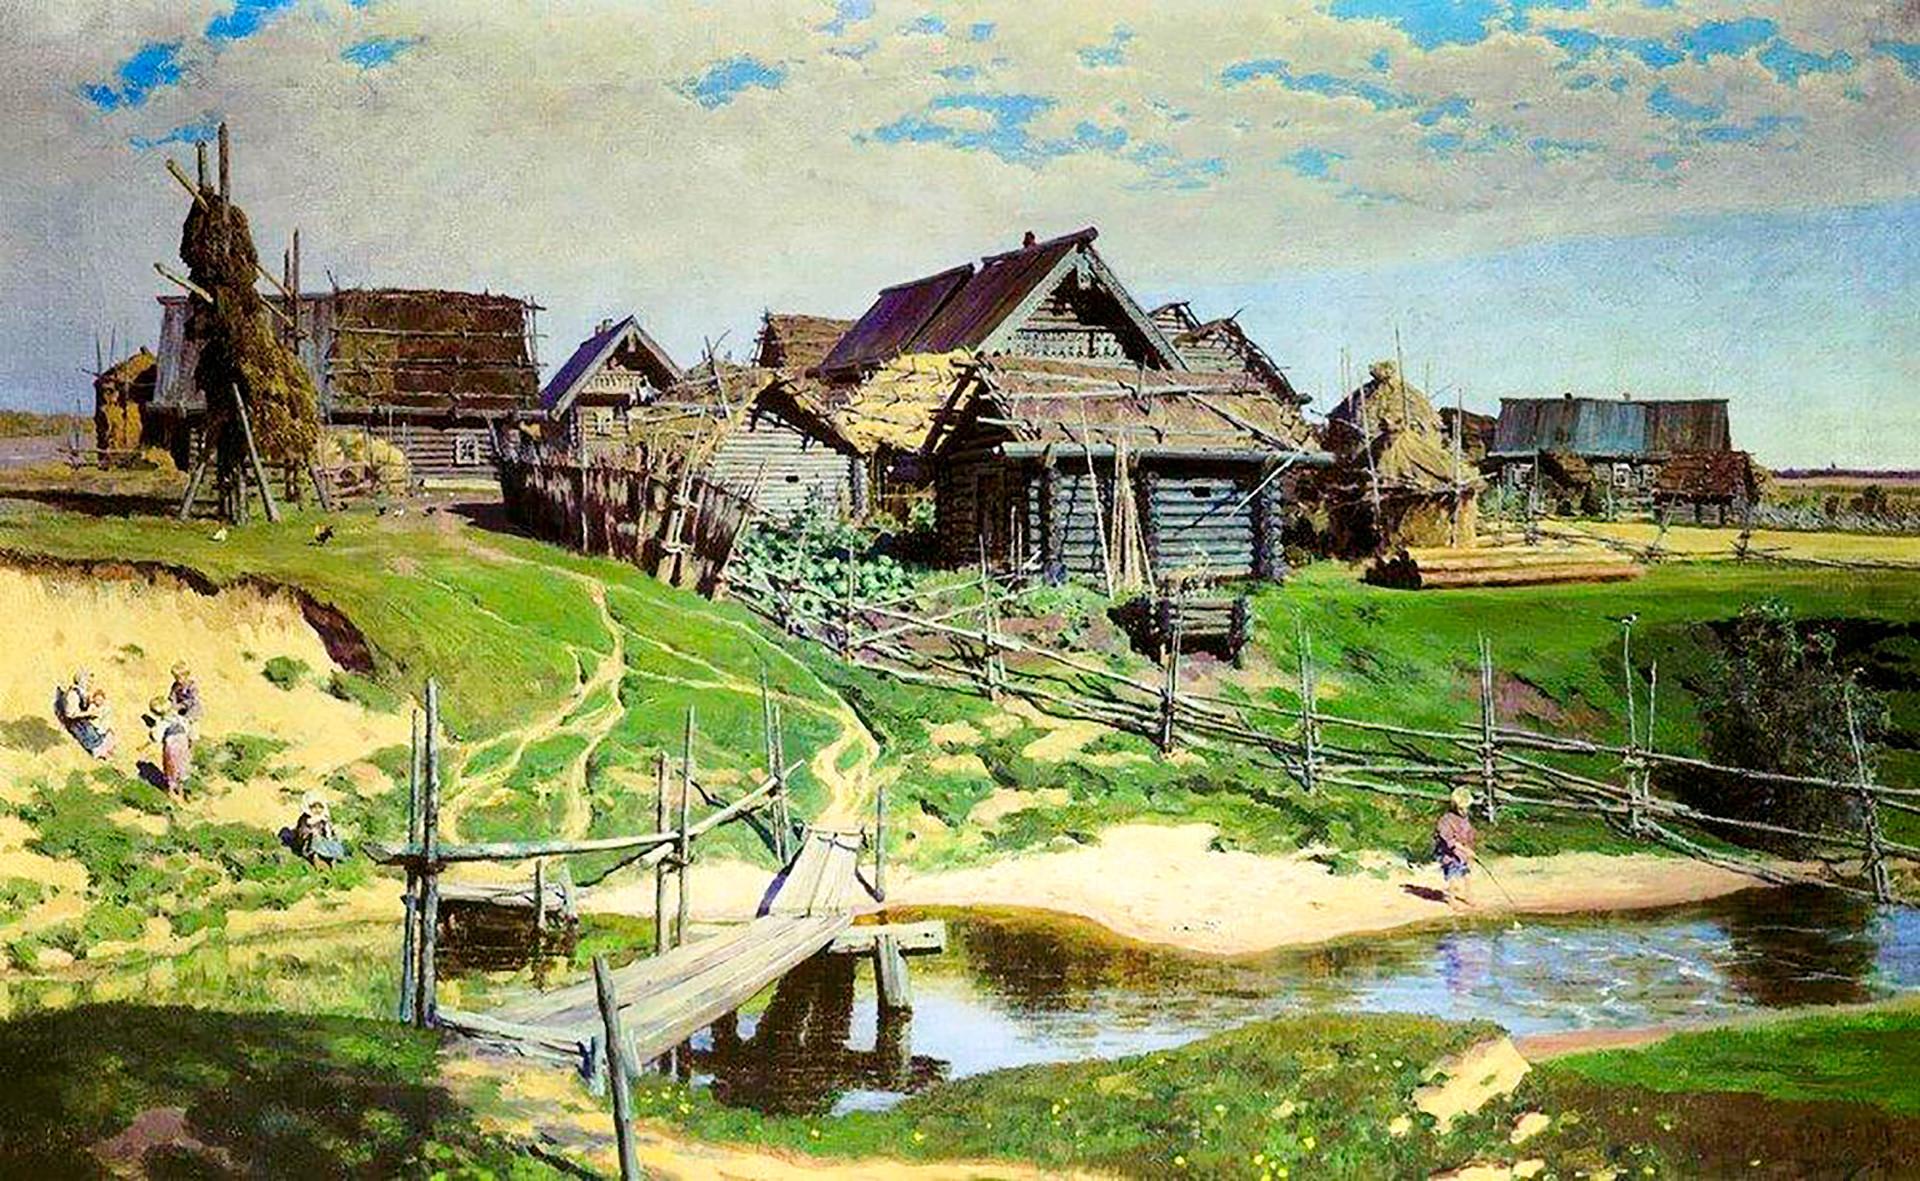 Vasily Polenov, Pedesaan Rusia, 1889